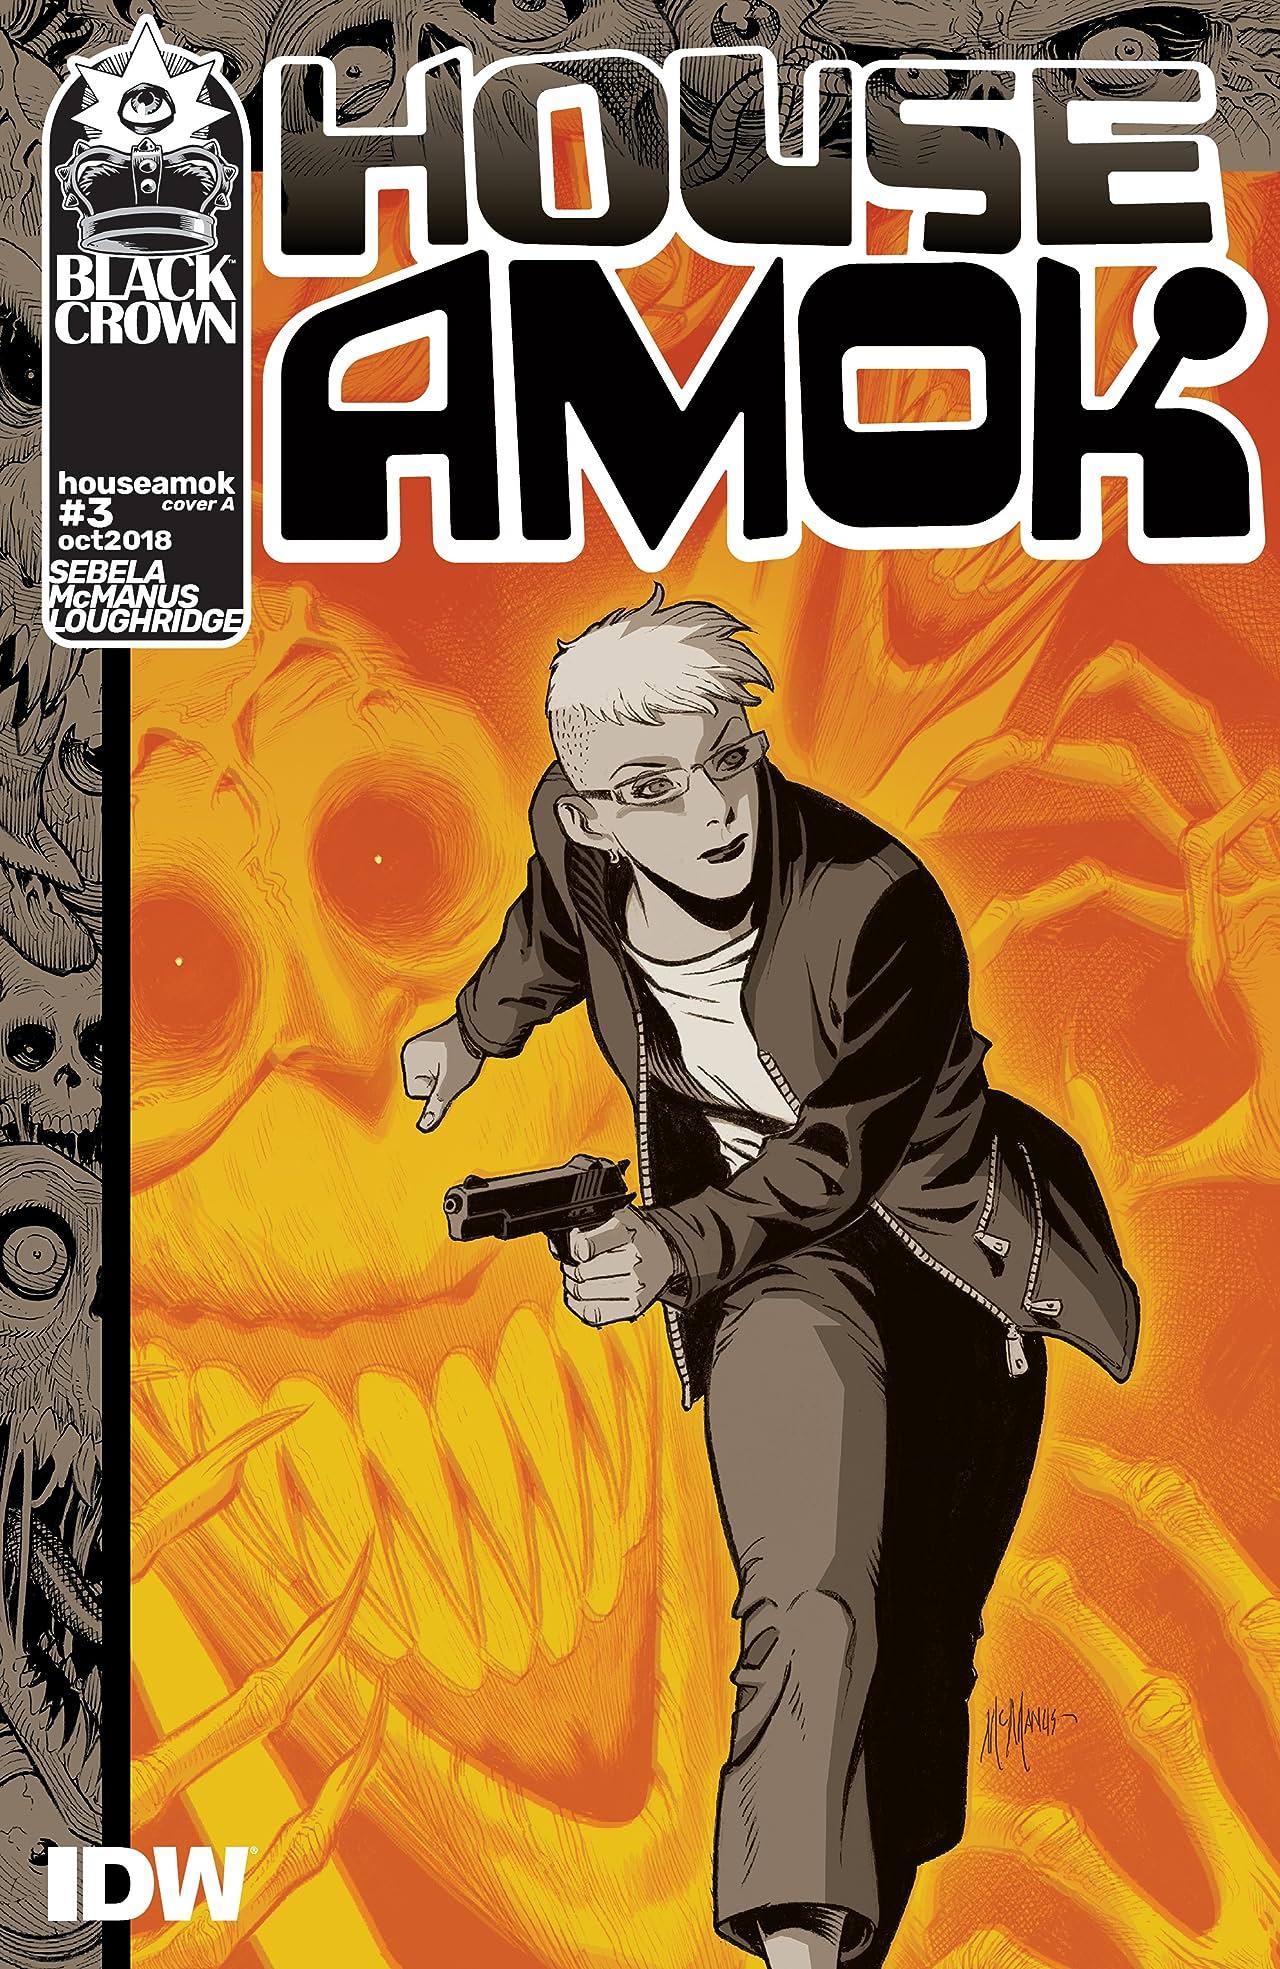 House Amok #3